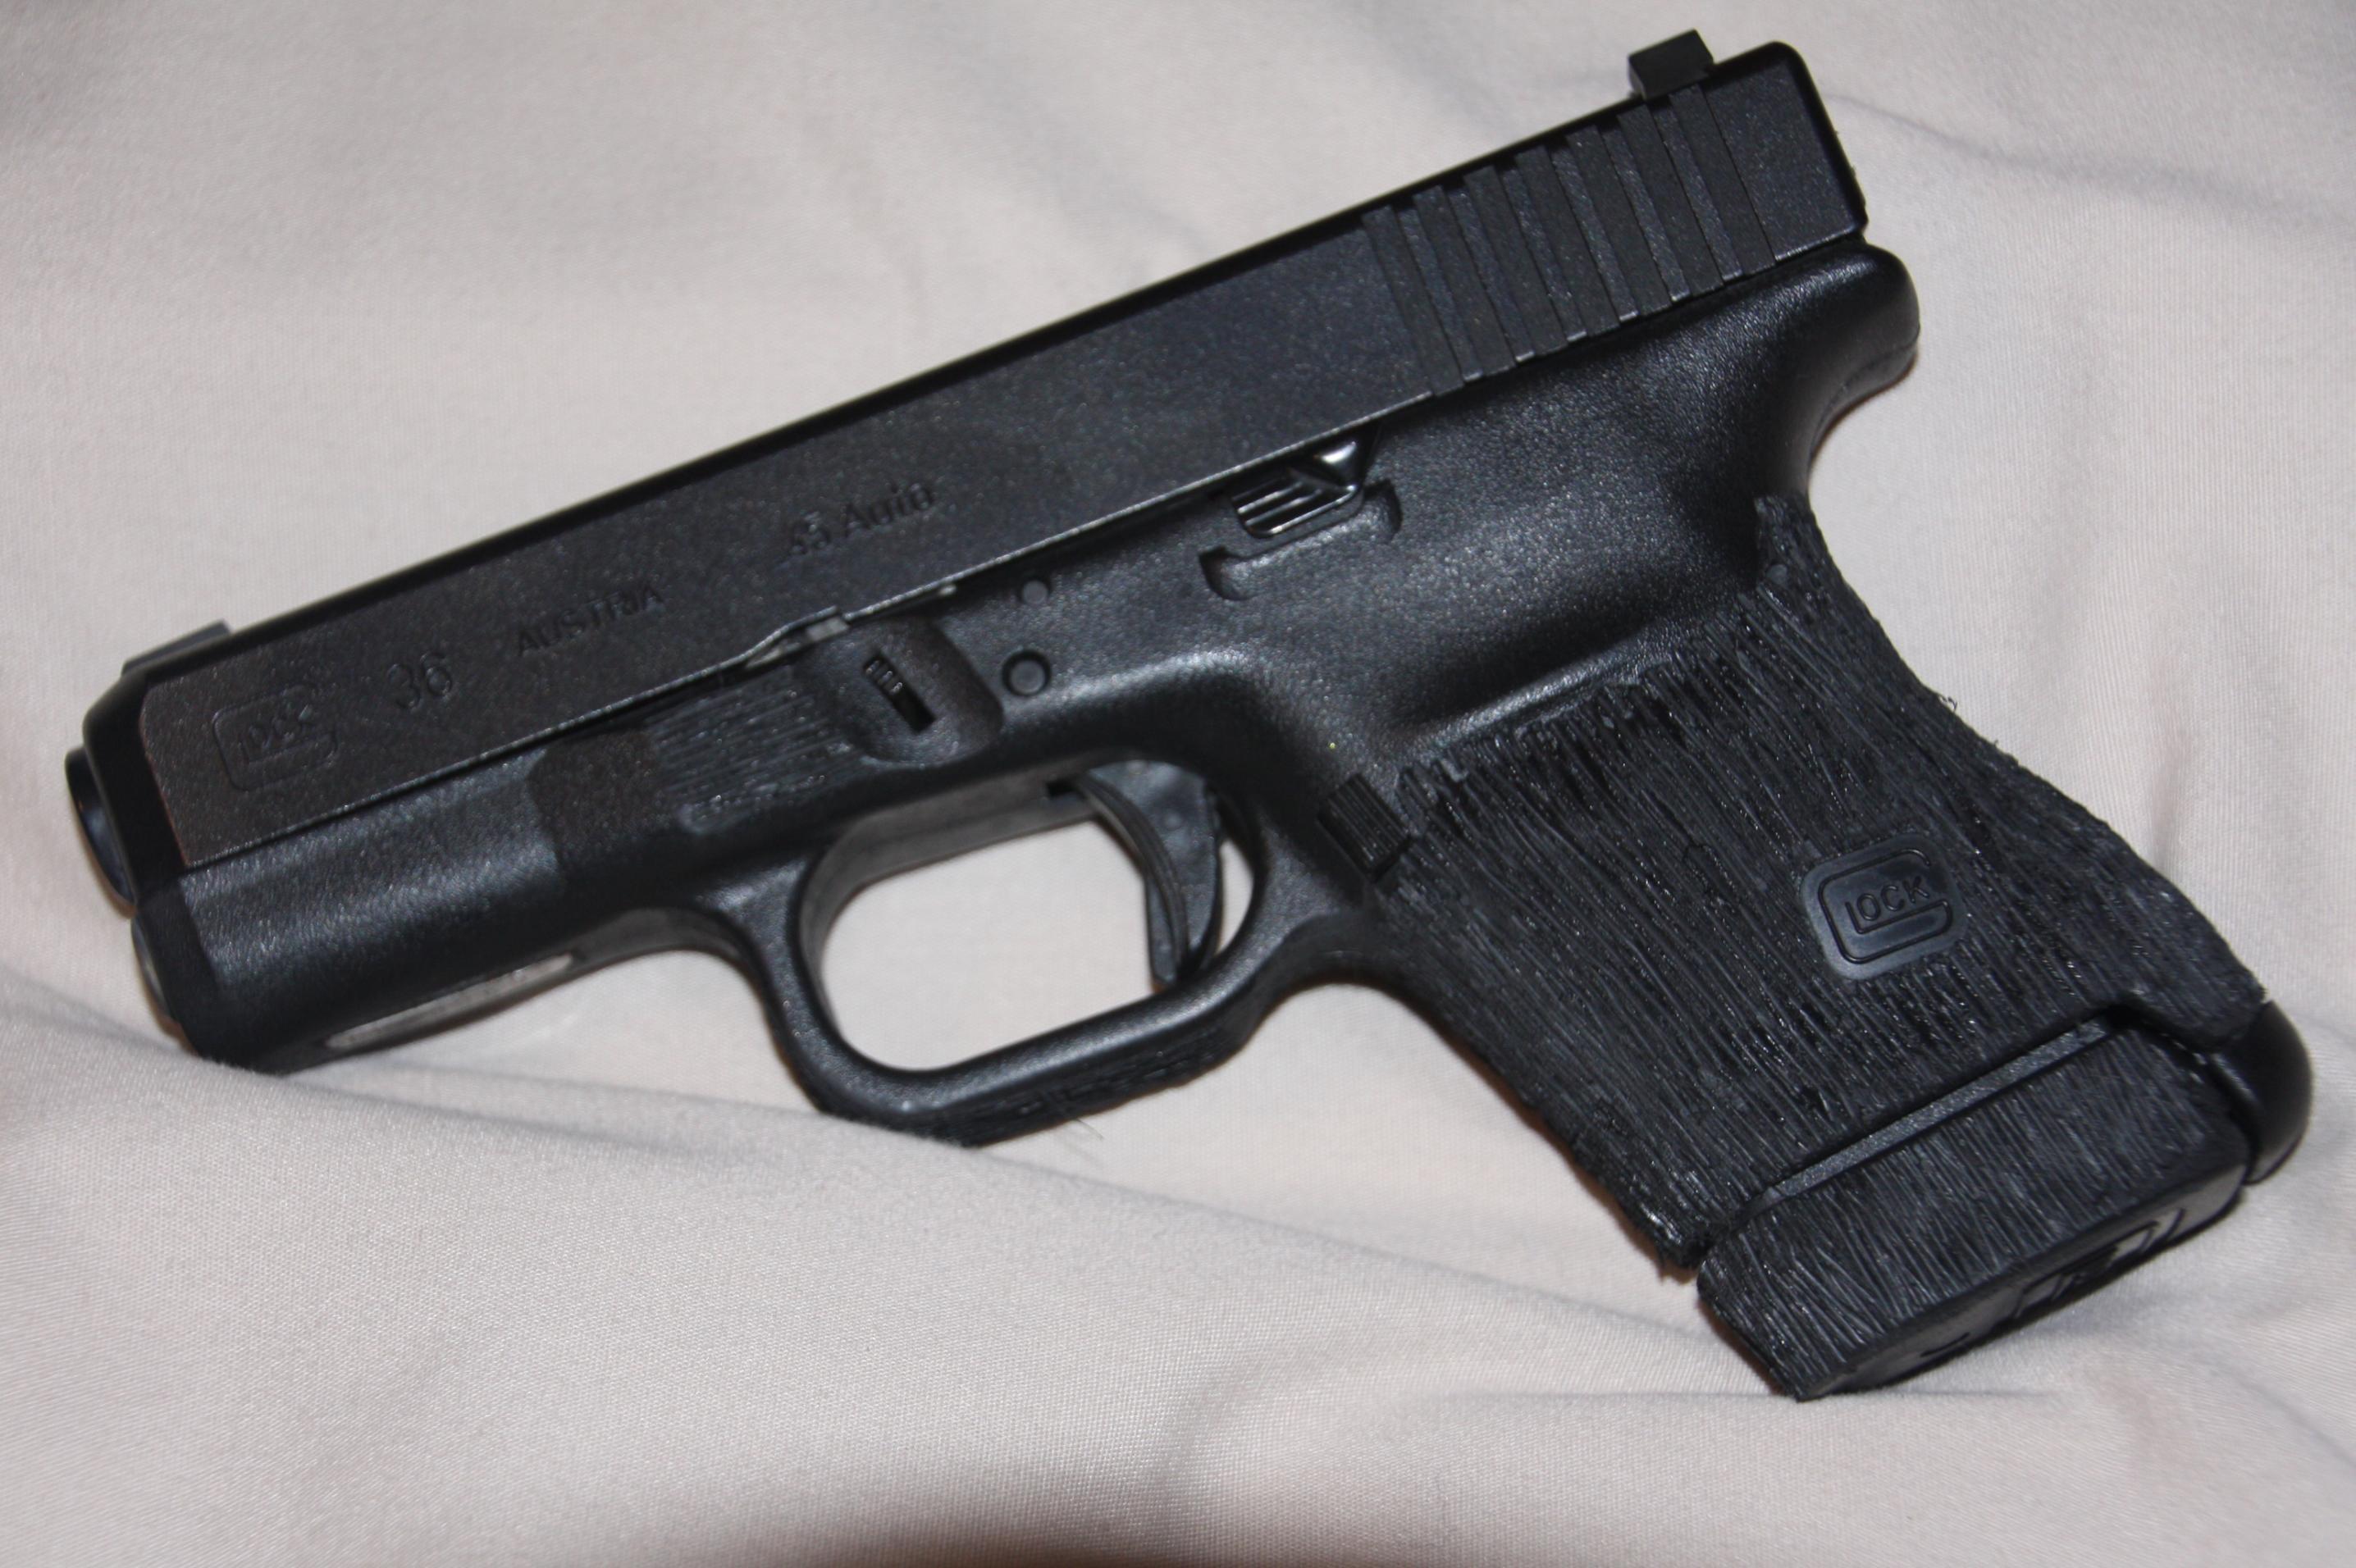 Glock 30/36 Hybrid - Glock 30S-img_0002.jpg